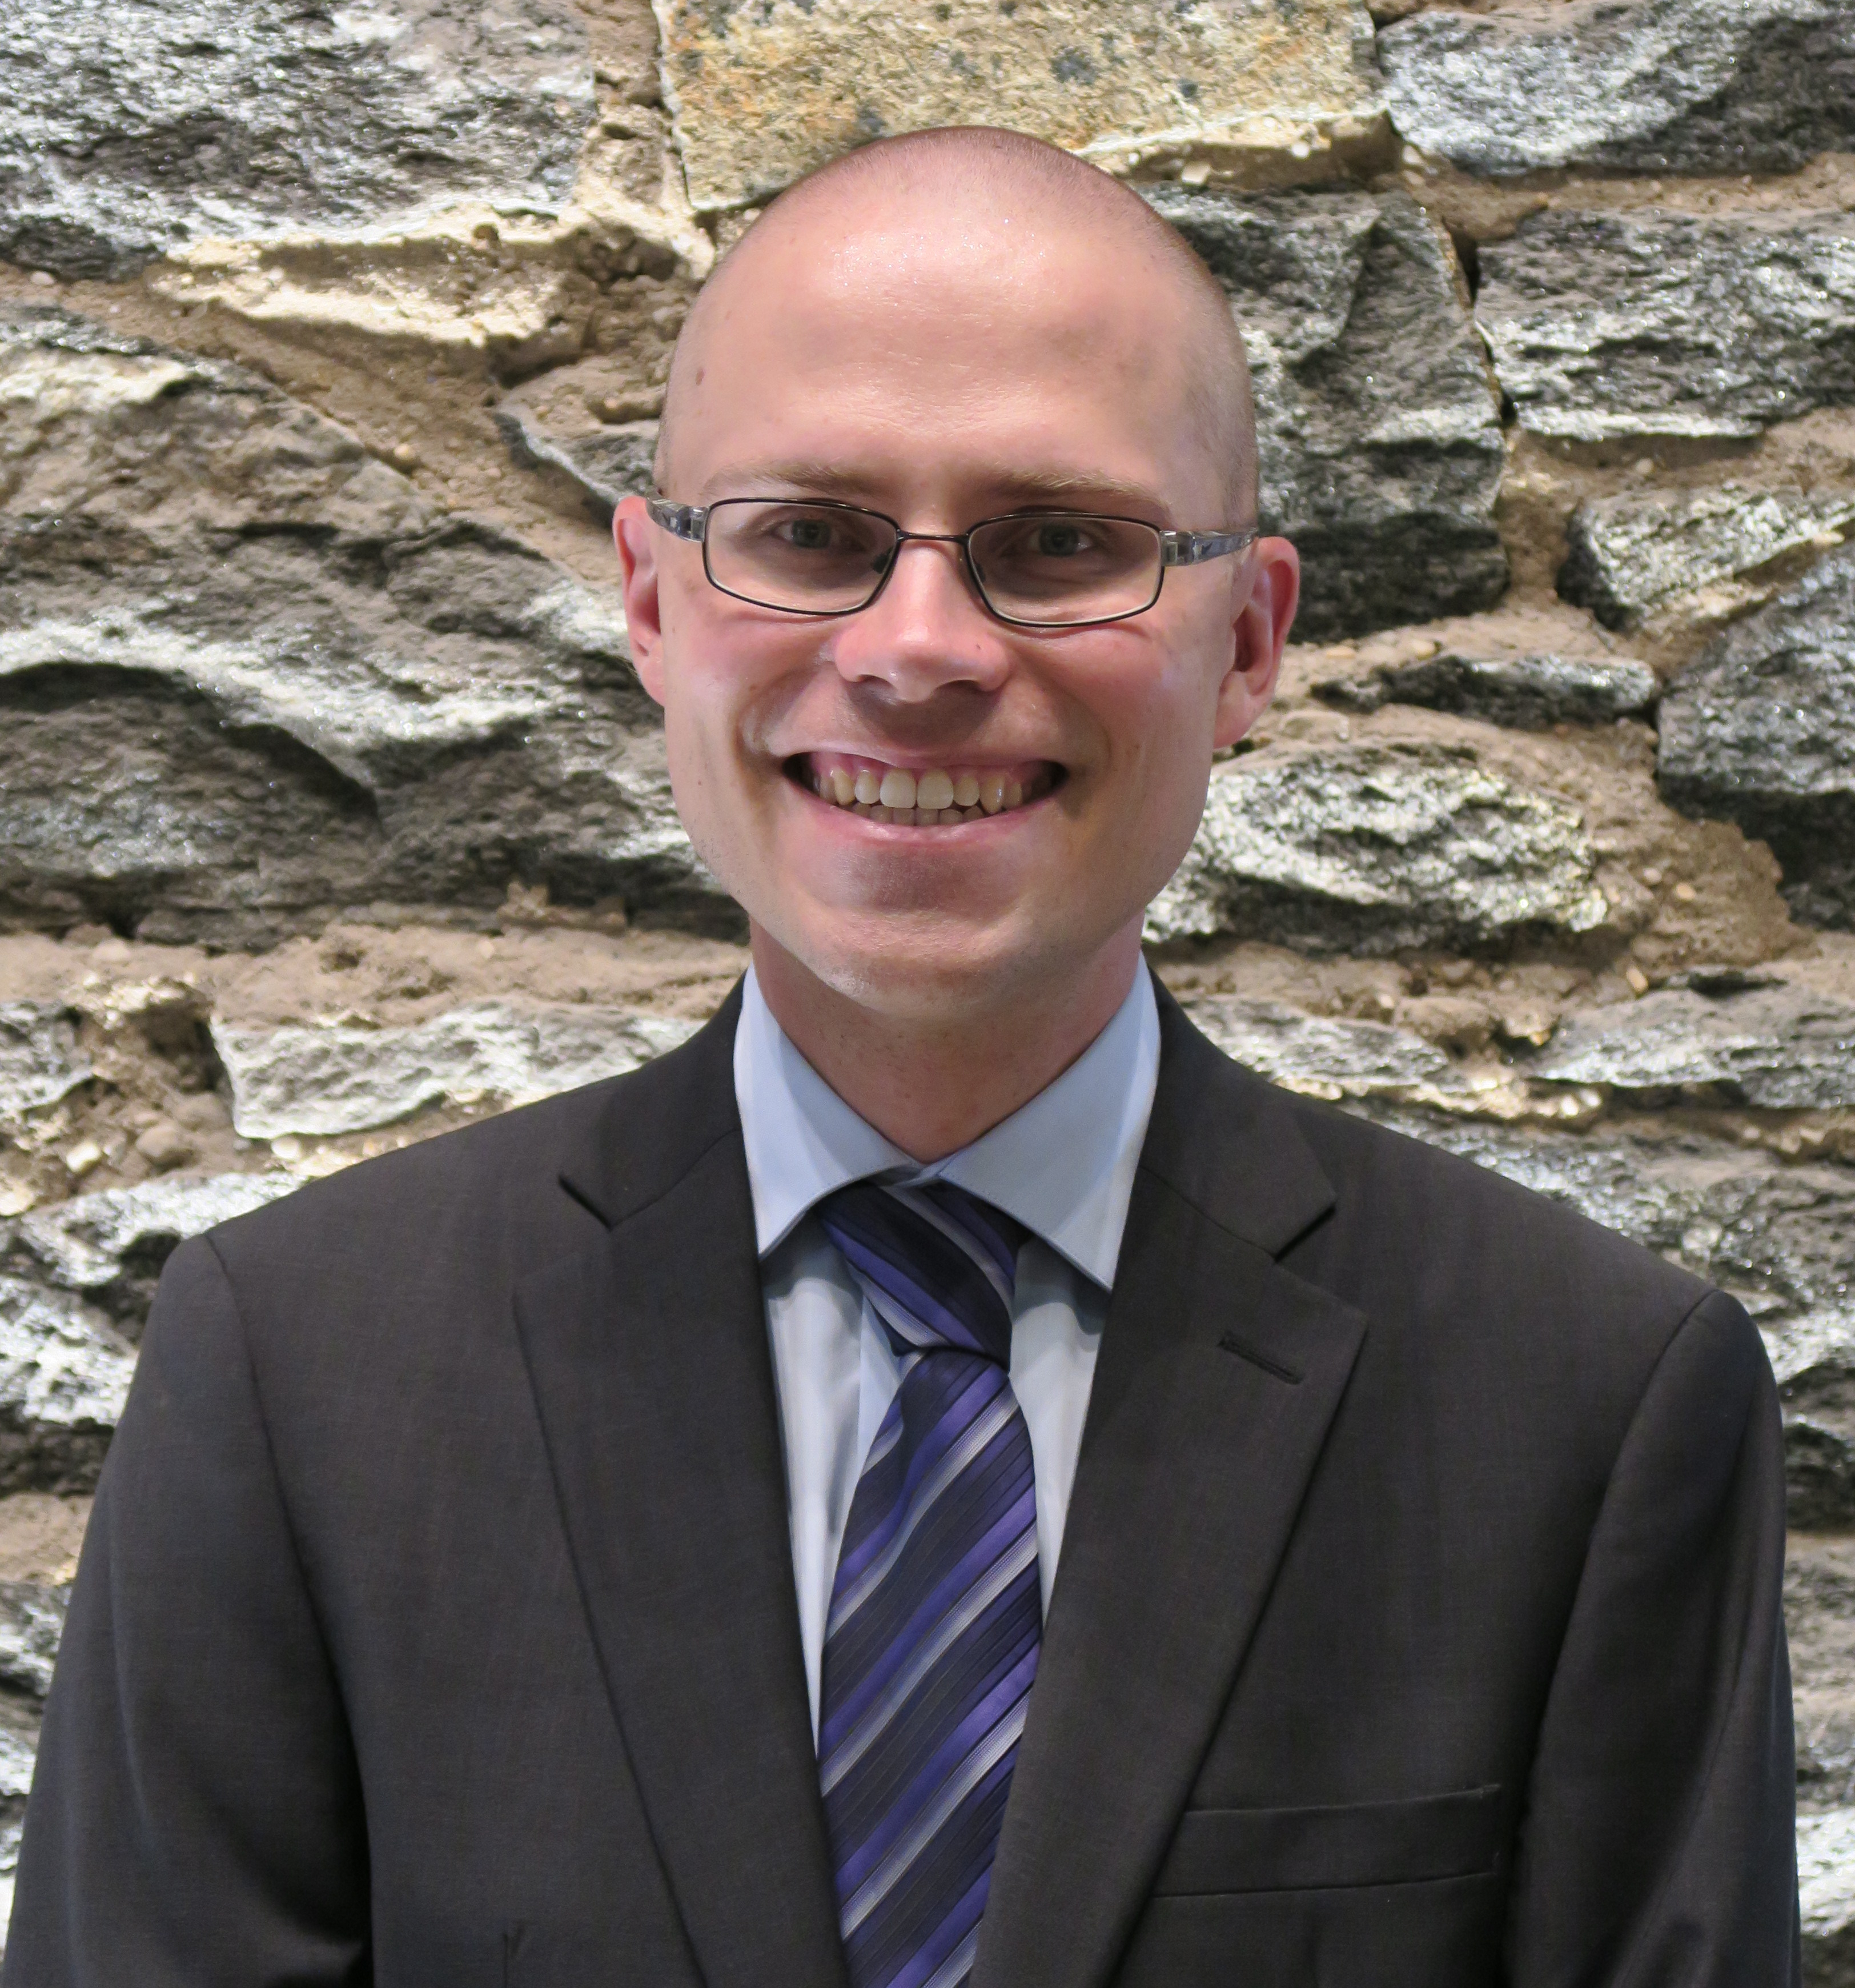 Johannes Urpelainen's picture